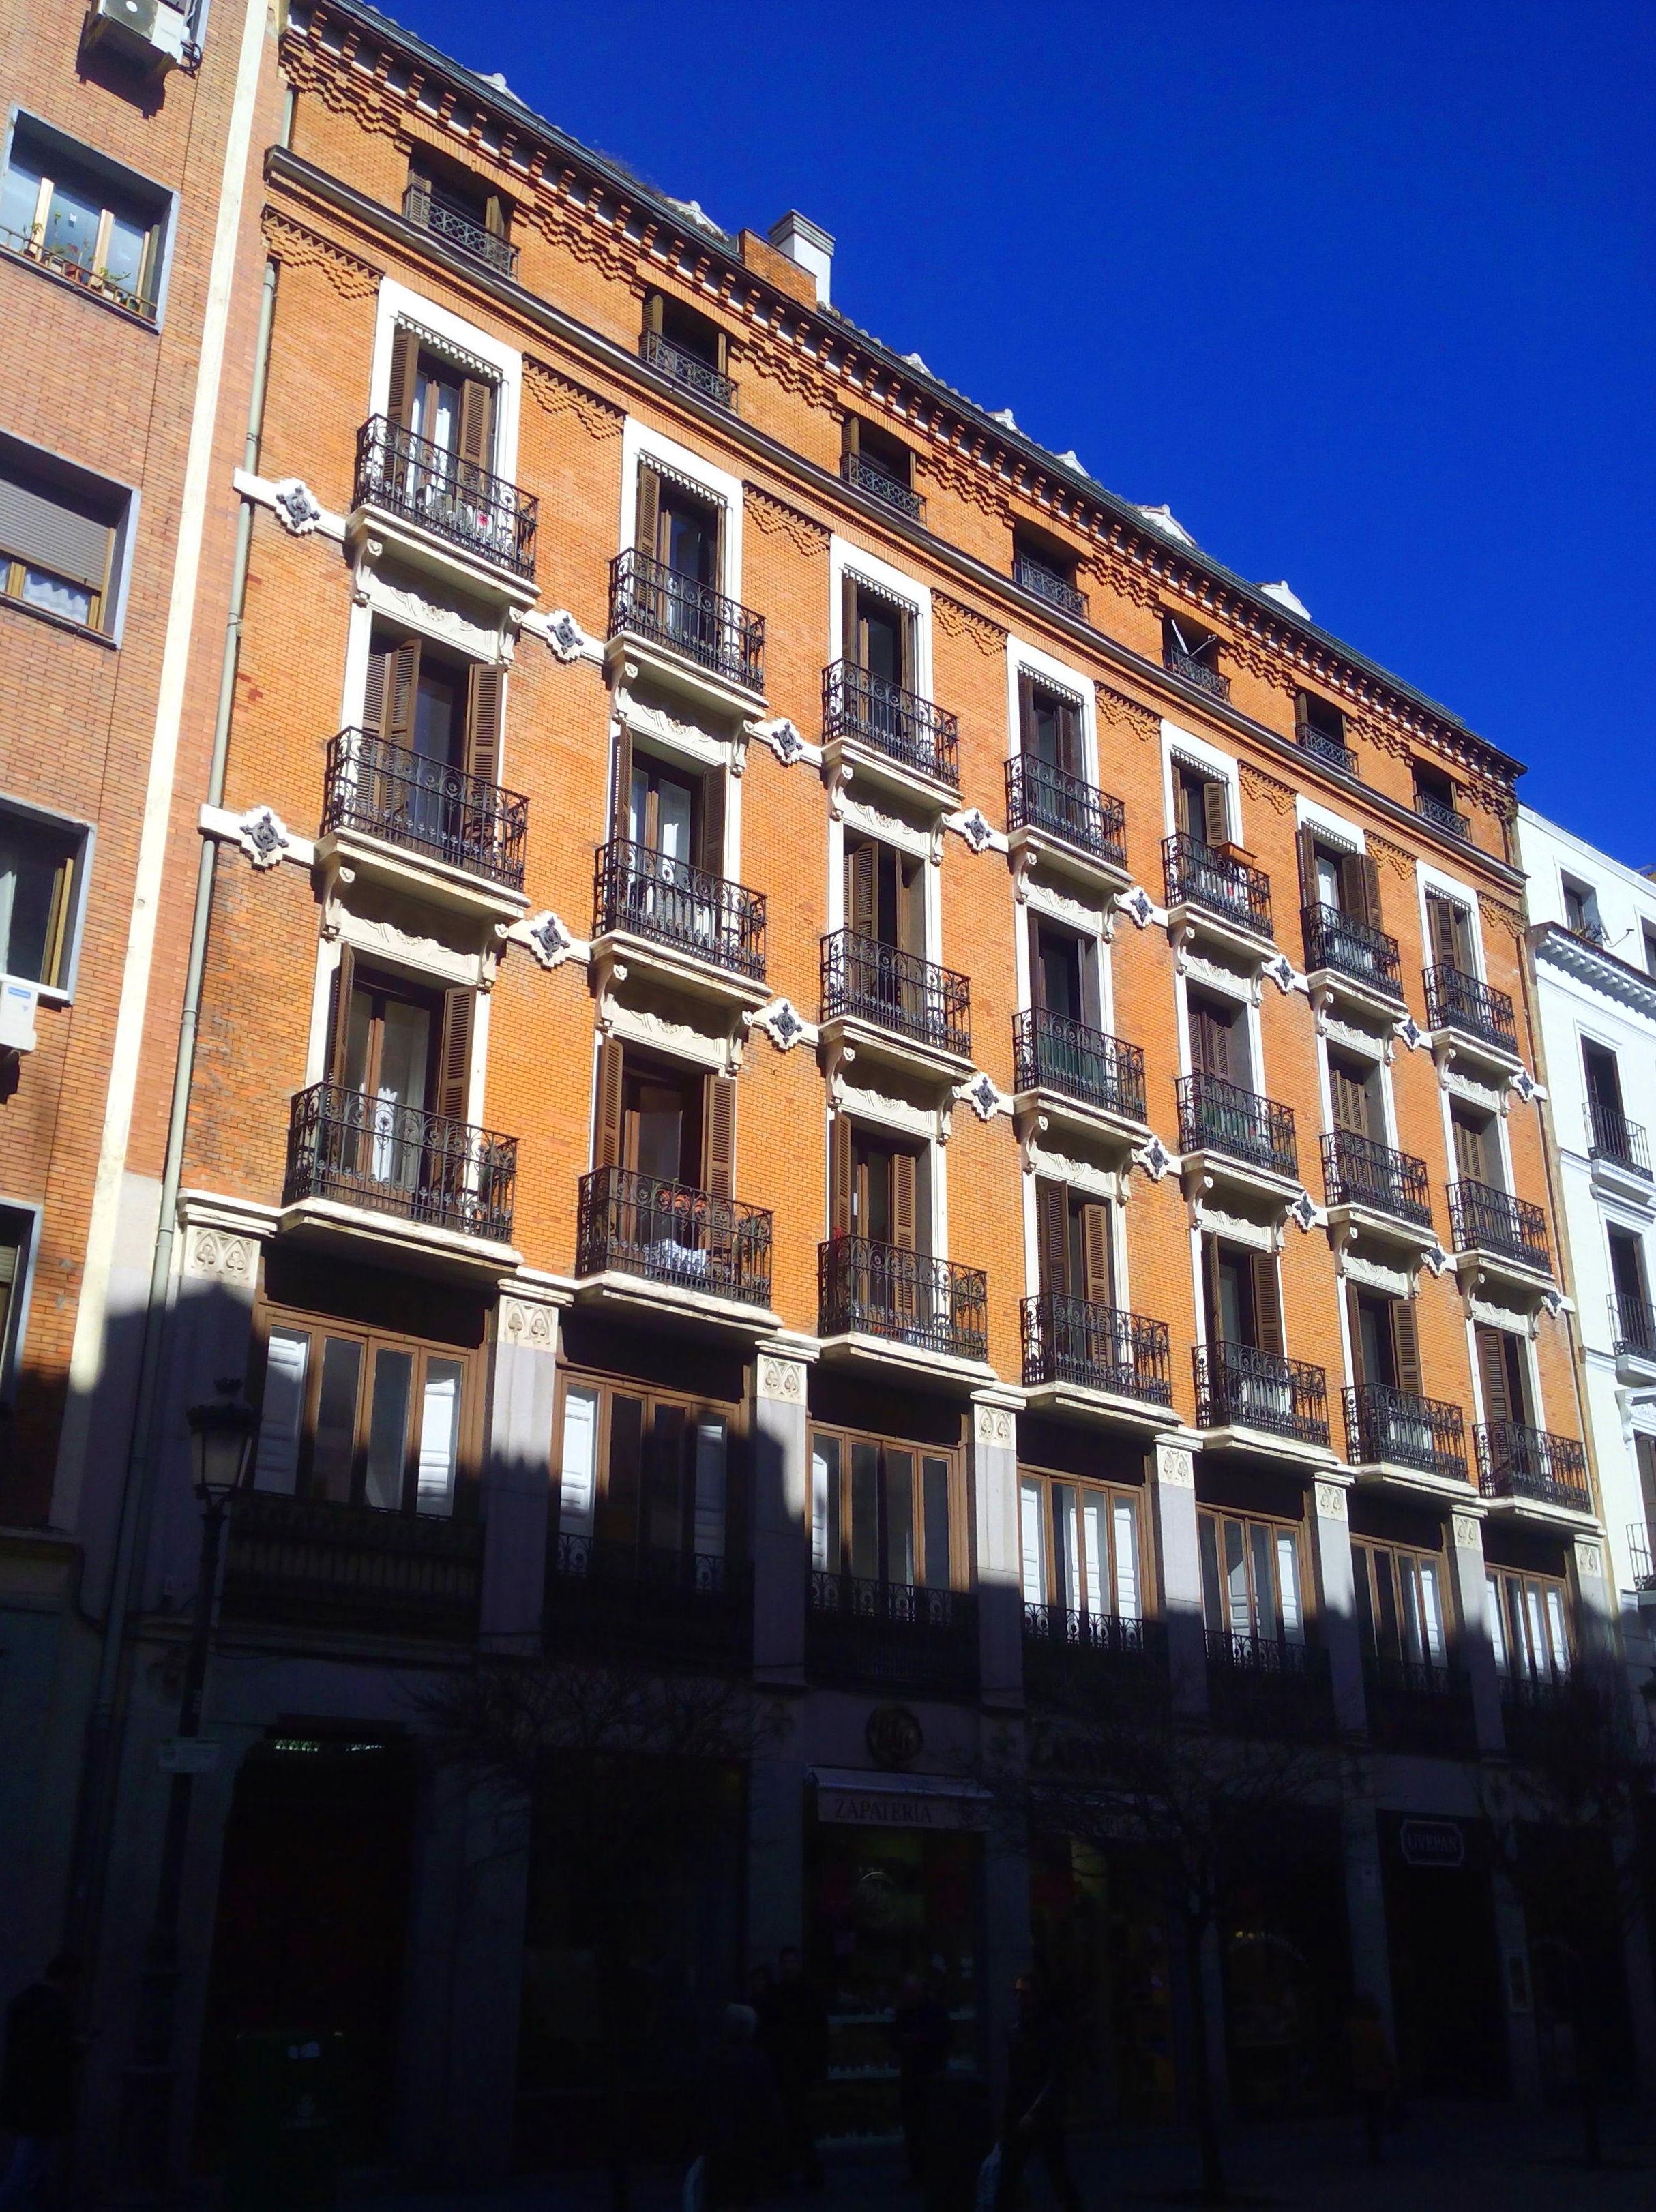 Obra apartamentos tur sticos centro de madrid obras servicios y tarifas de clima renova - Apartamento turistico madrid ...